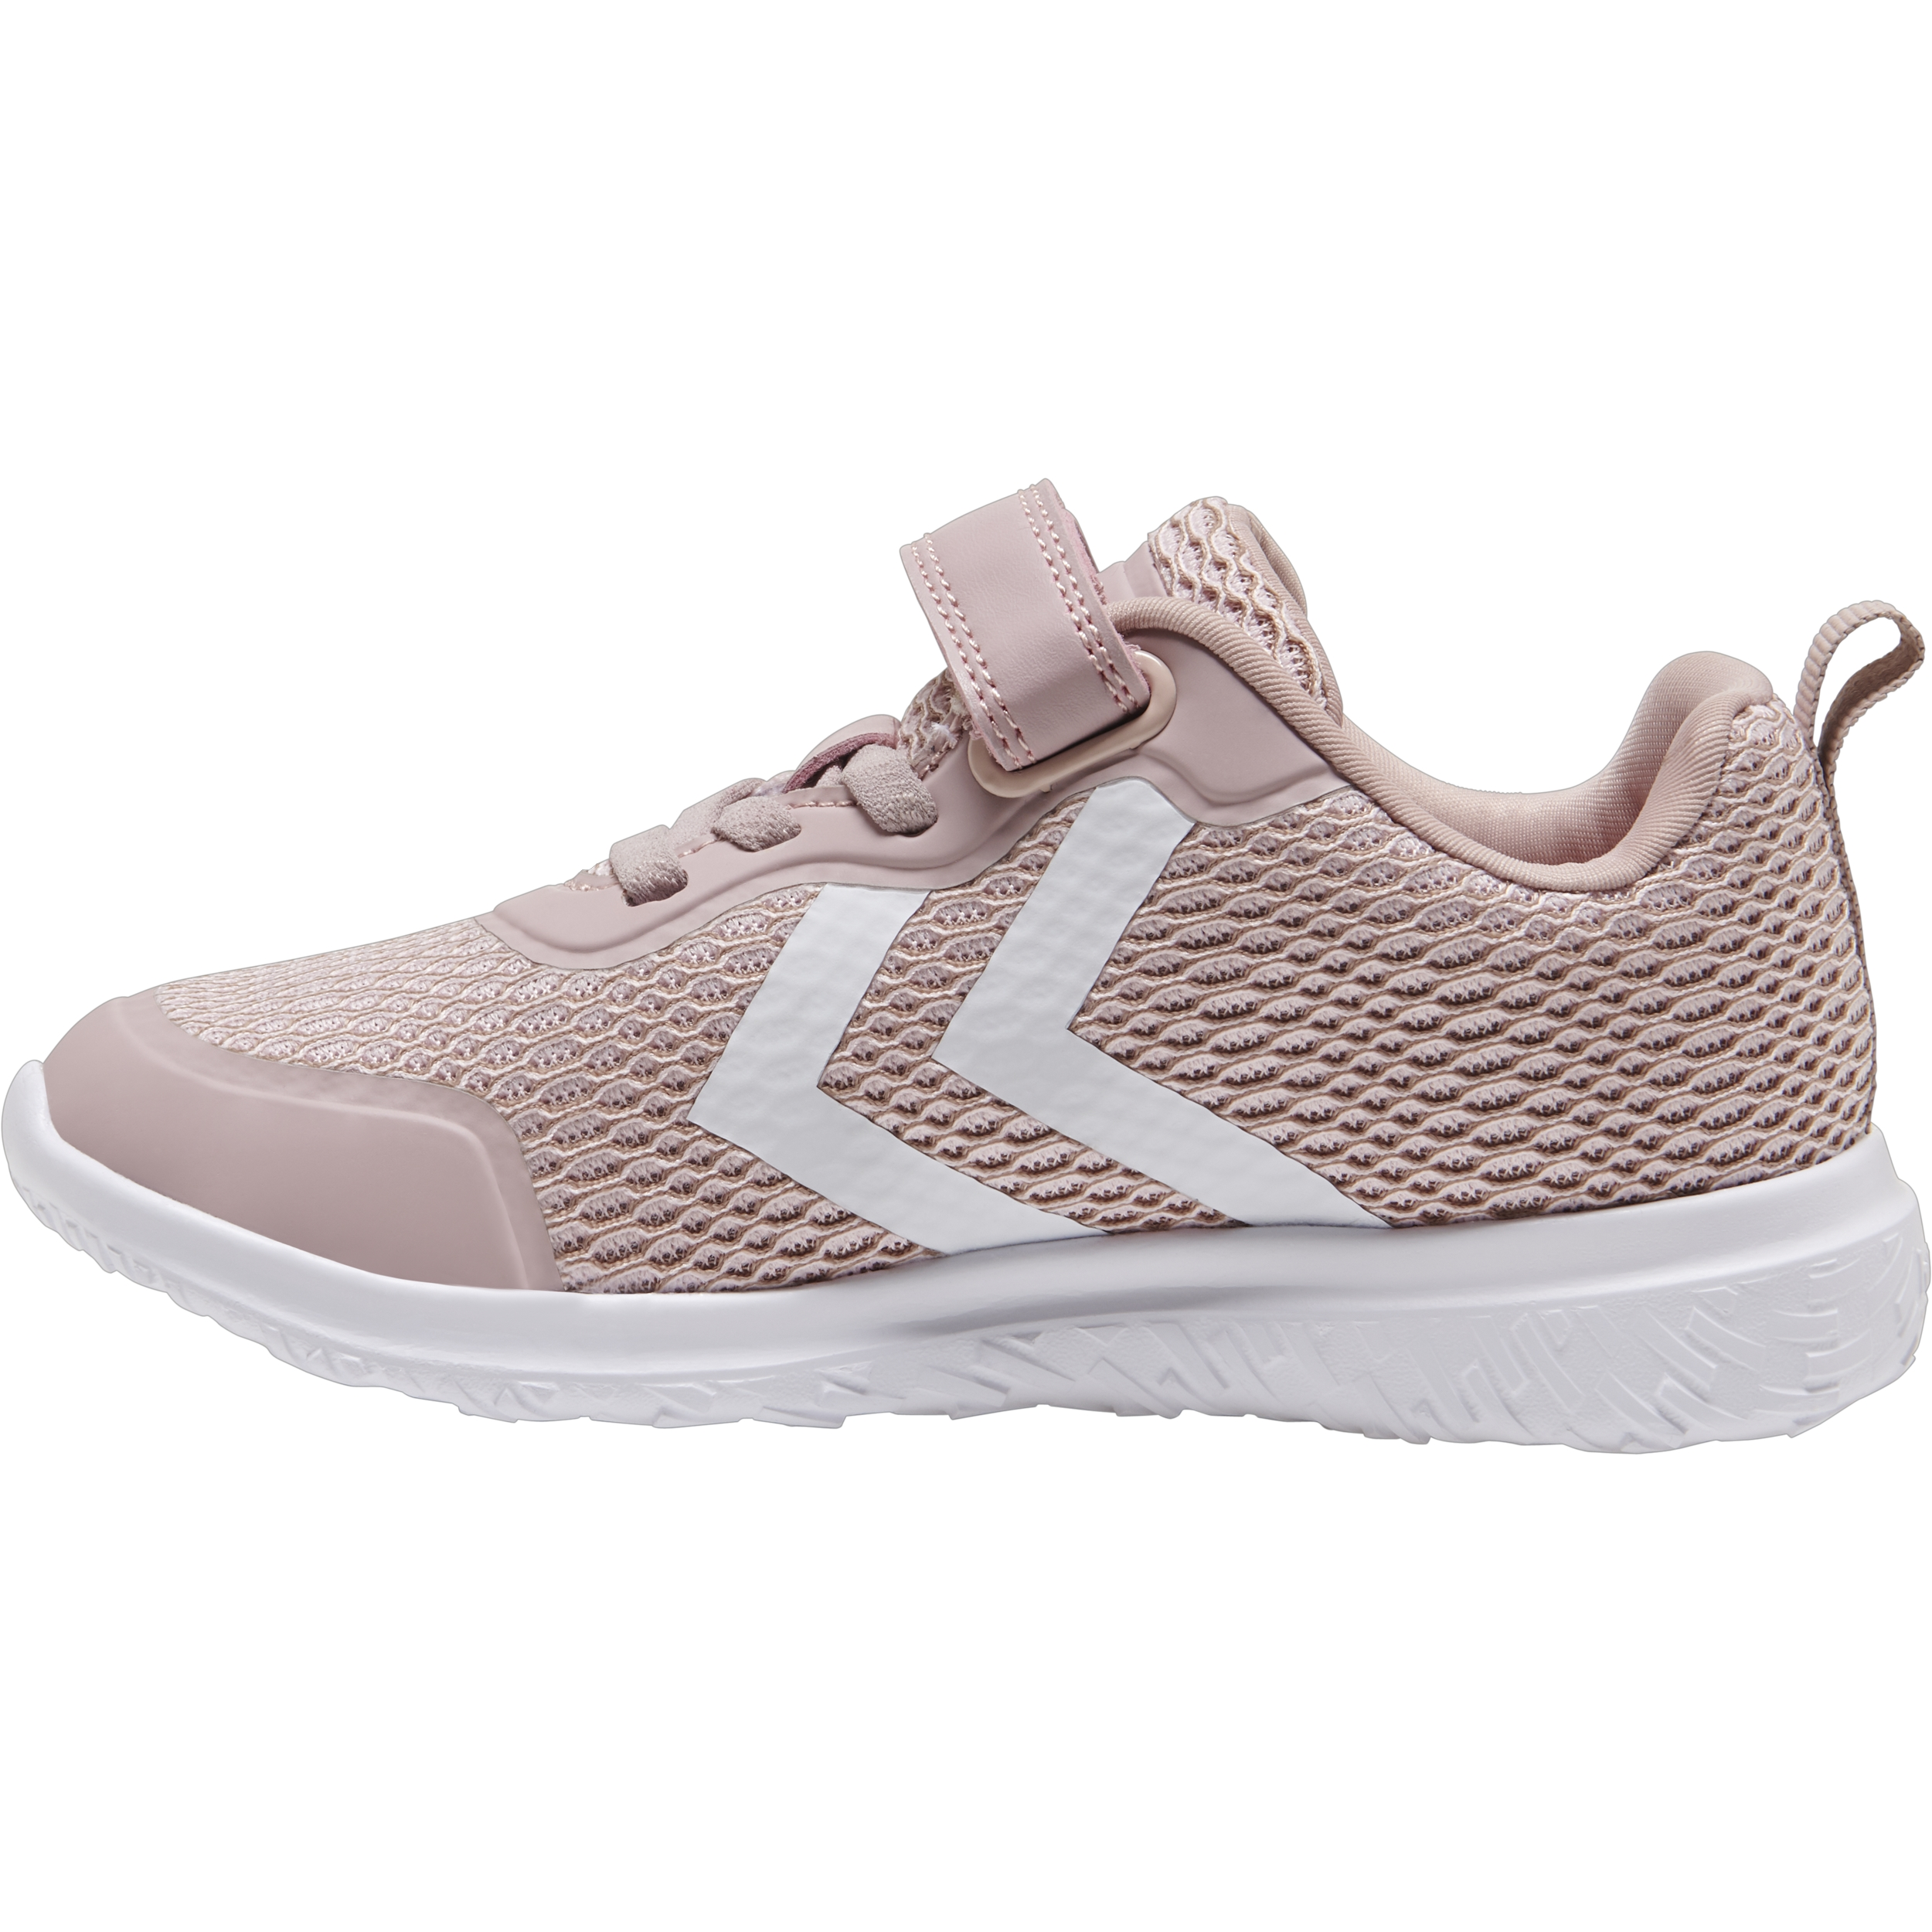 Hummel Actus Jr. sneakers, pale lilac, 35